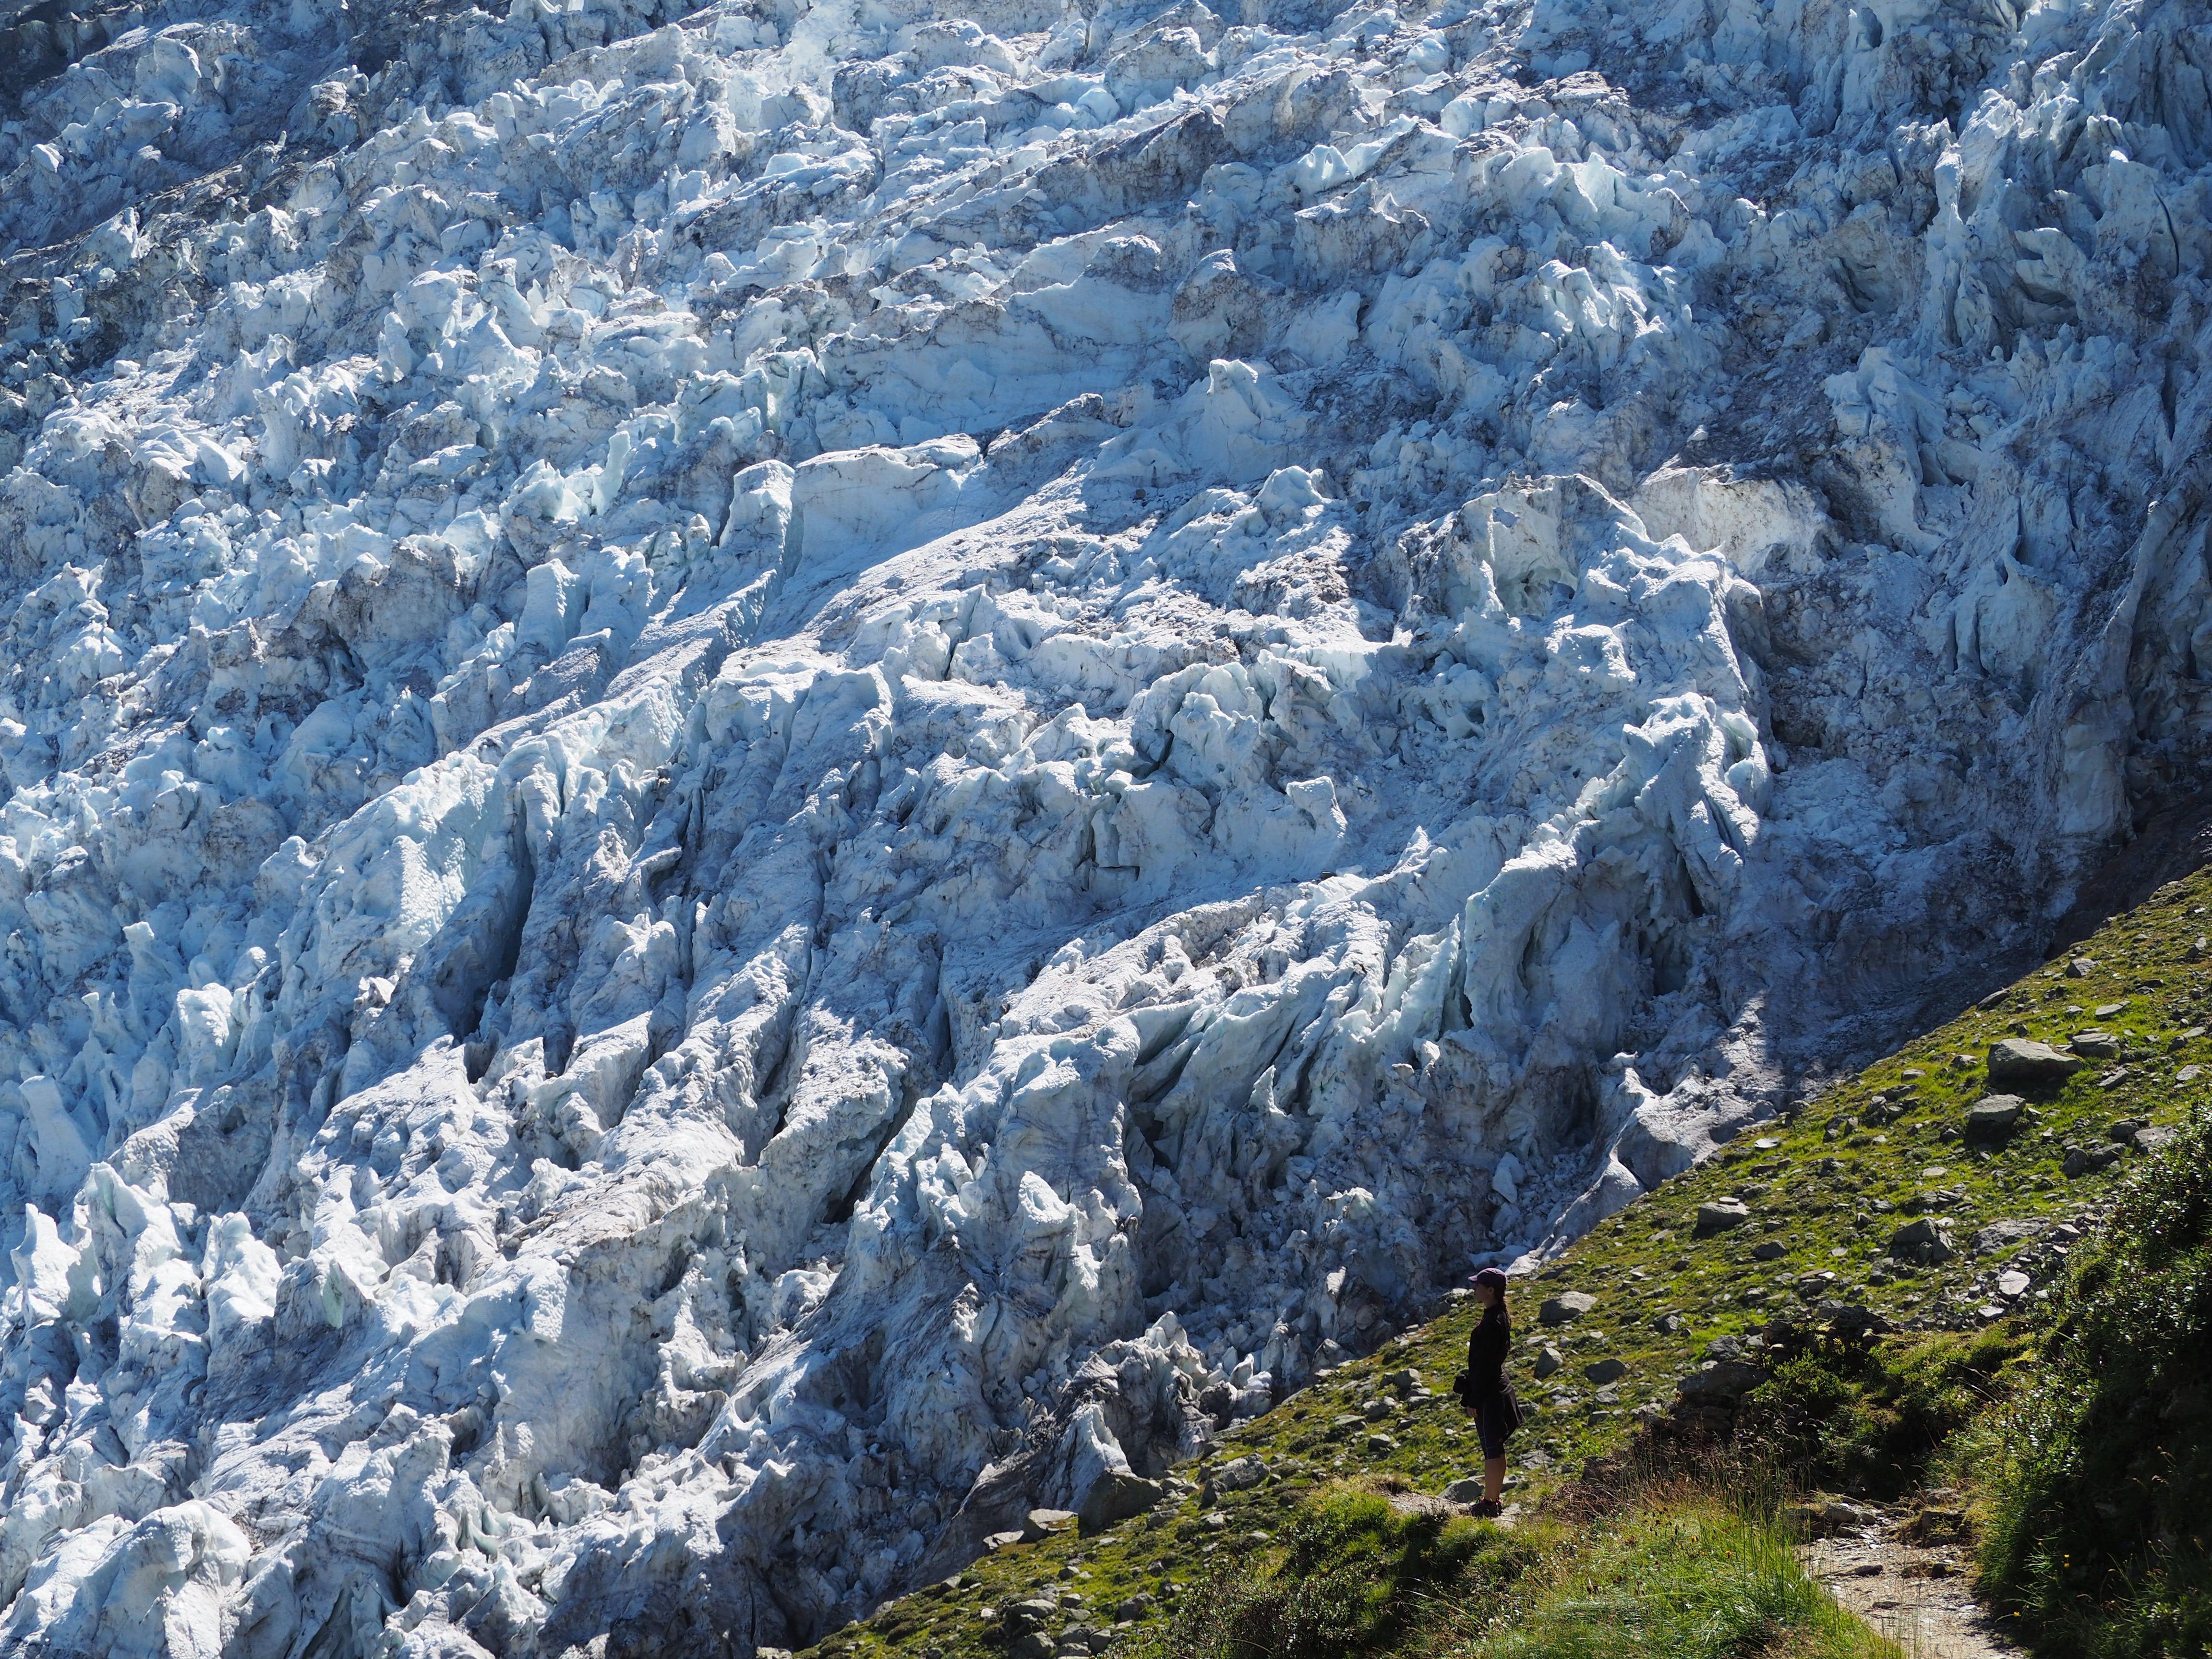 Le glacier de Bossons Chamonix, França#Miriam Pablos Cascallar 271